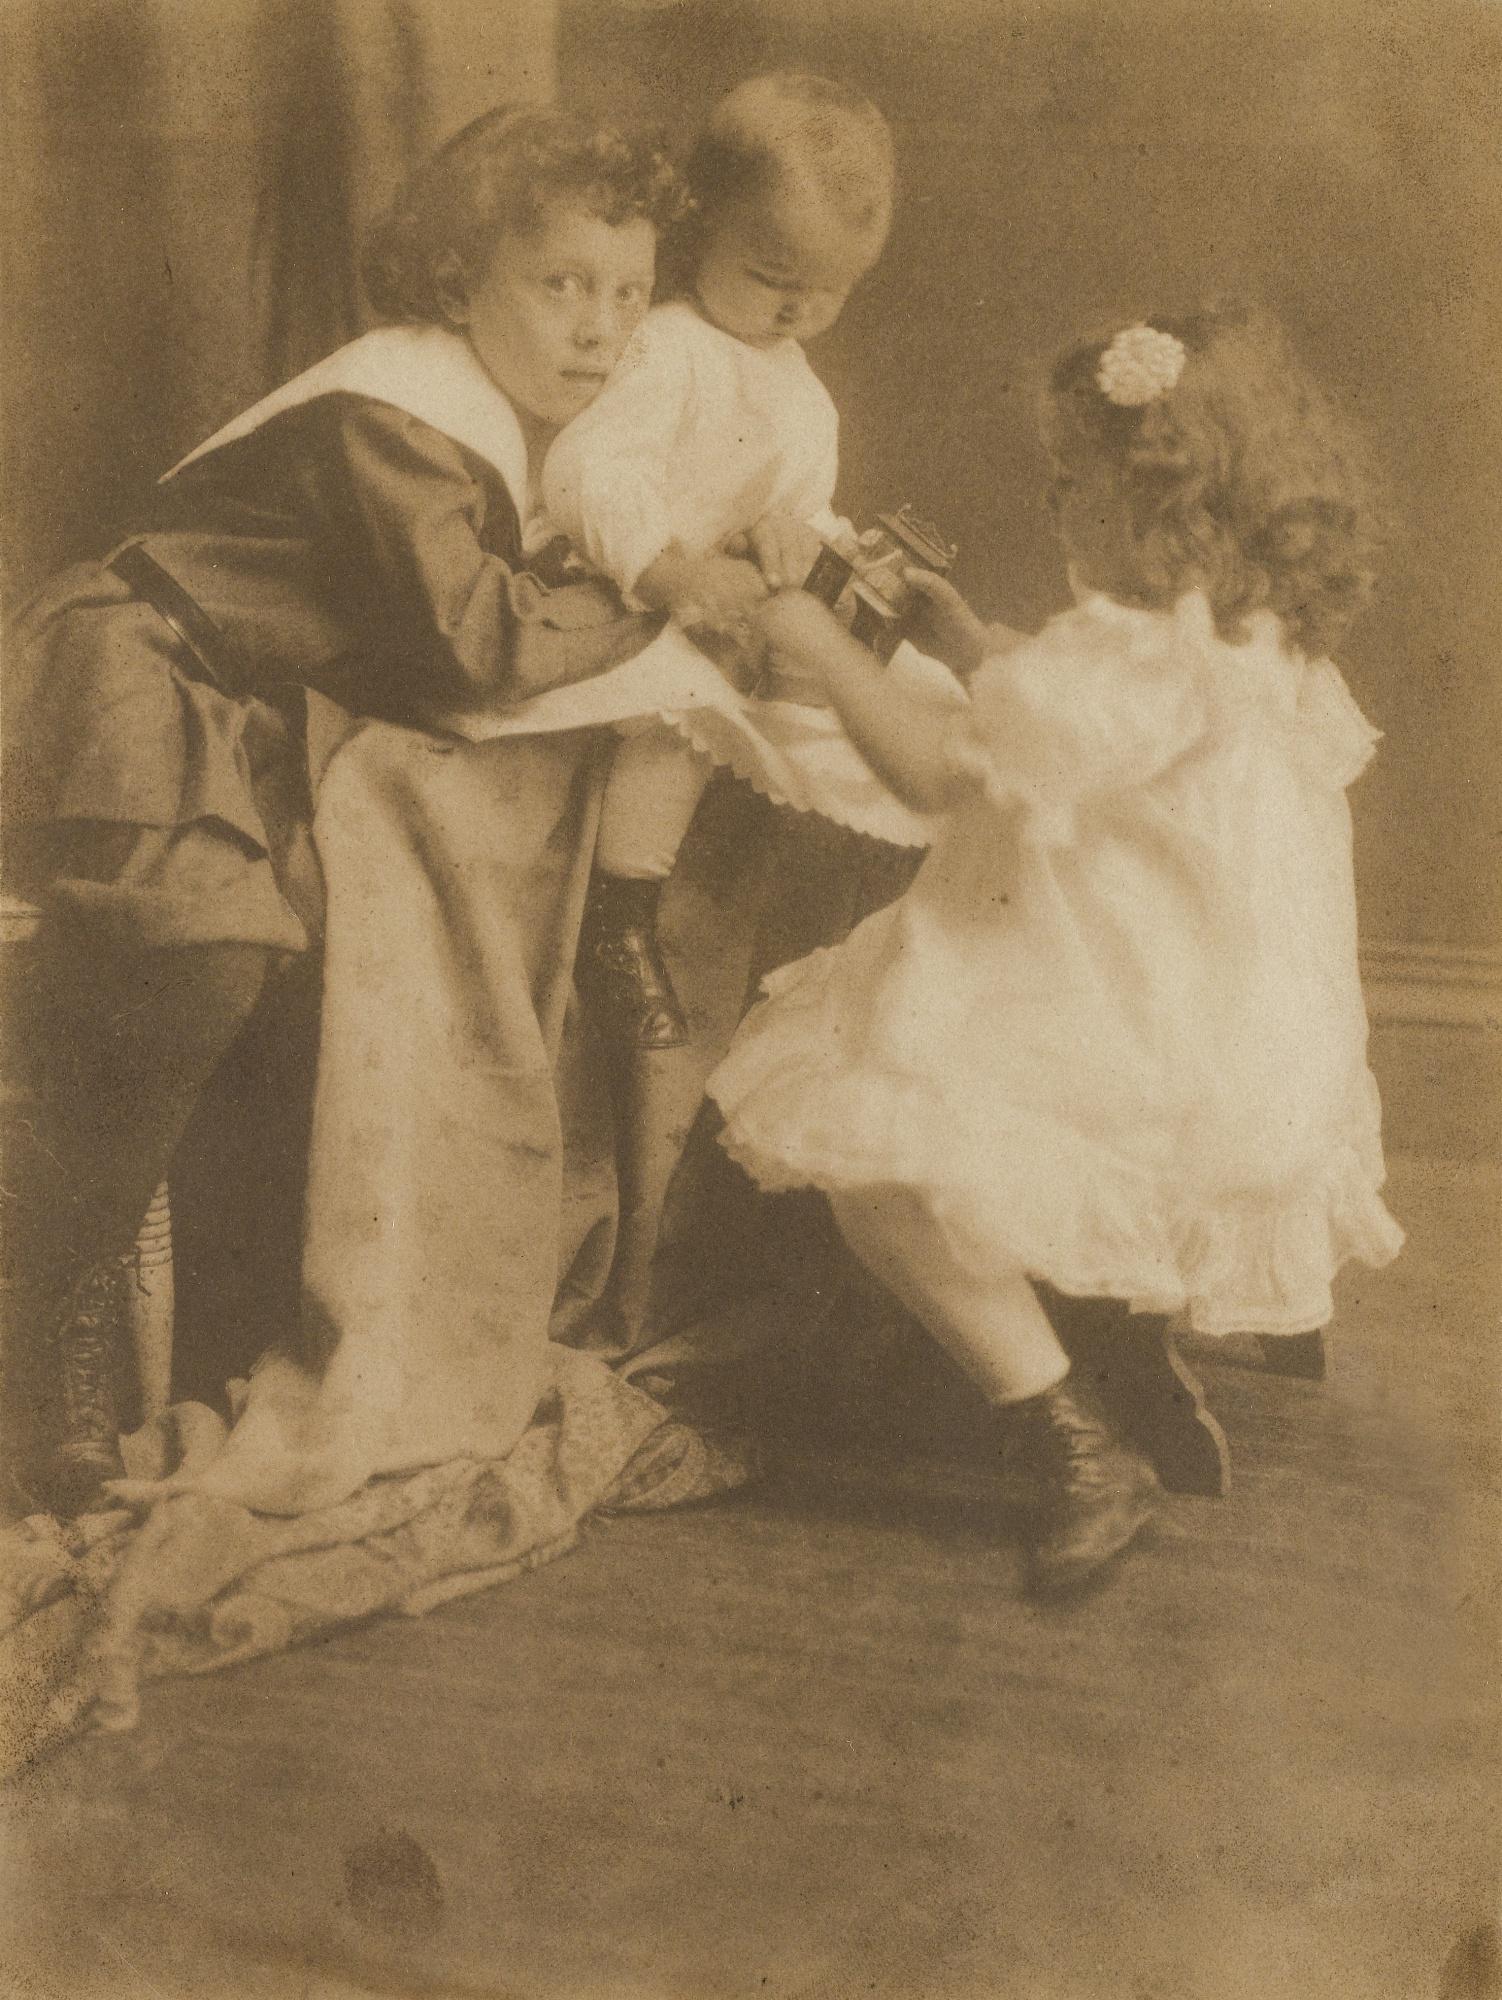 Gertrude Kasebier-Trois EnfantsVers-1902